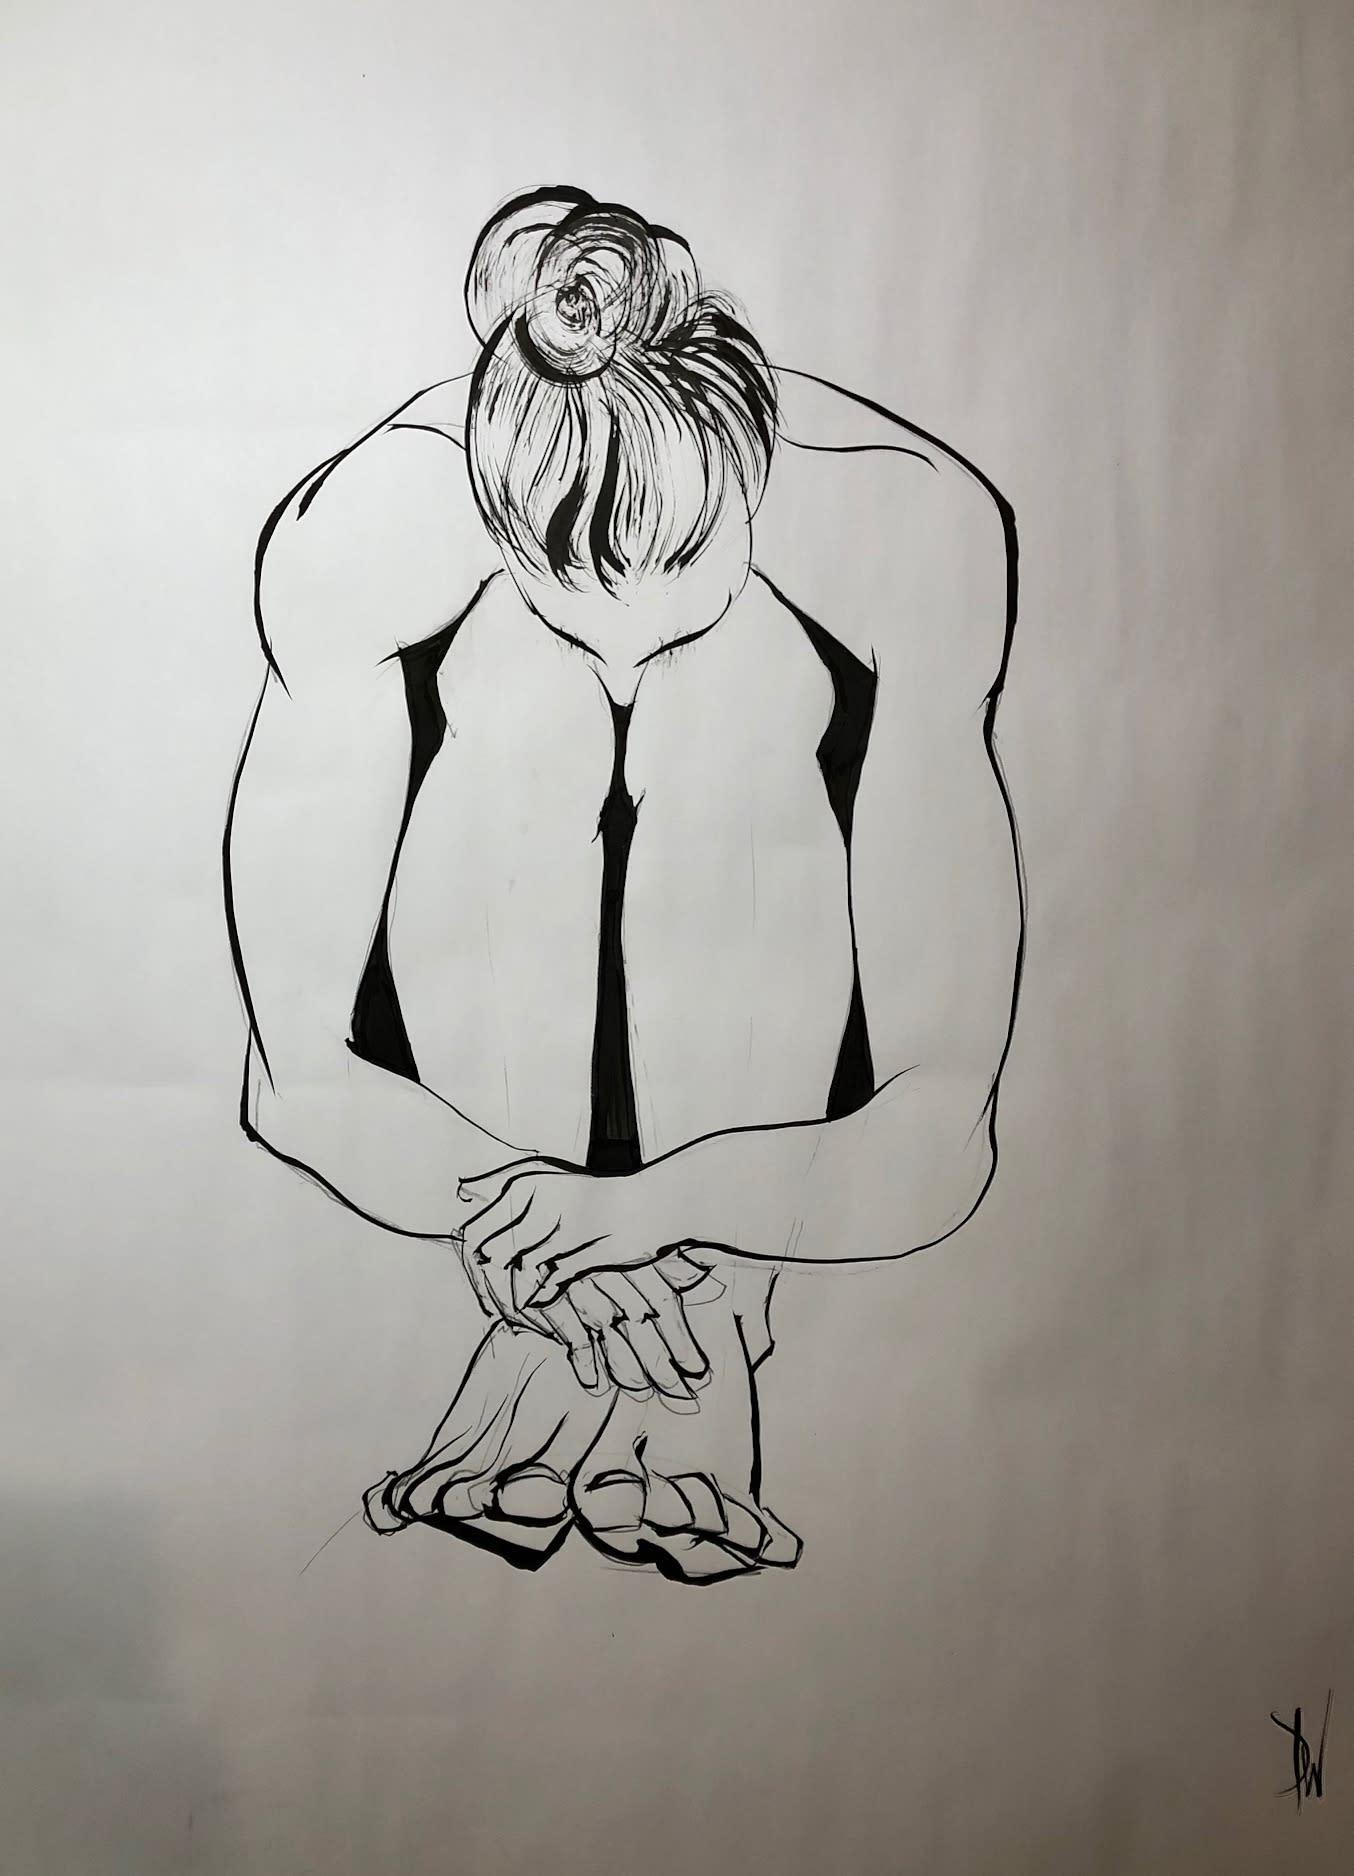 Peter3 yozkwd